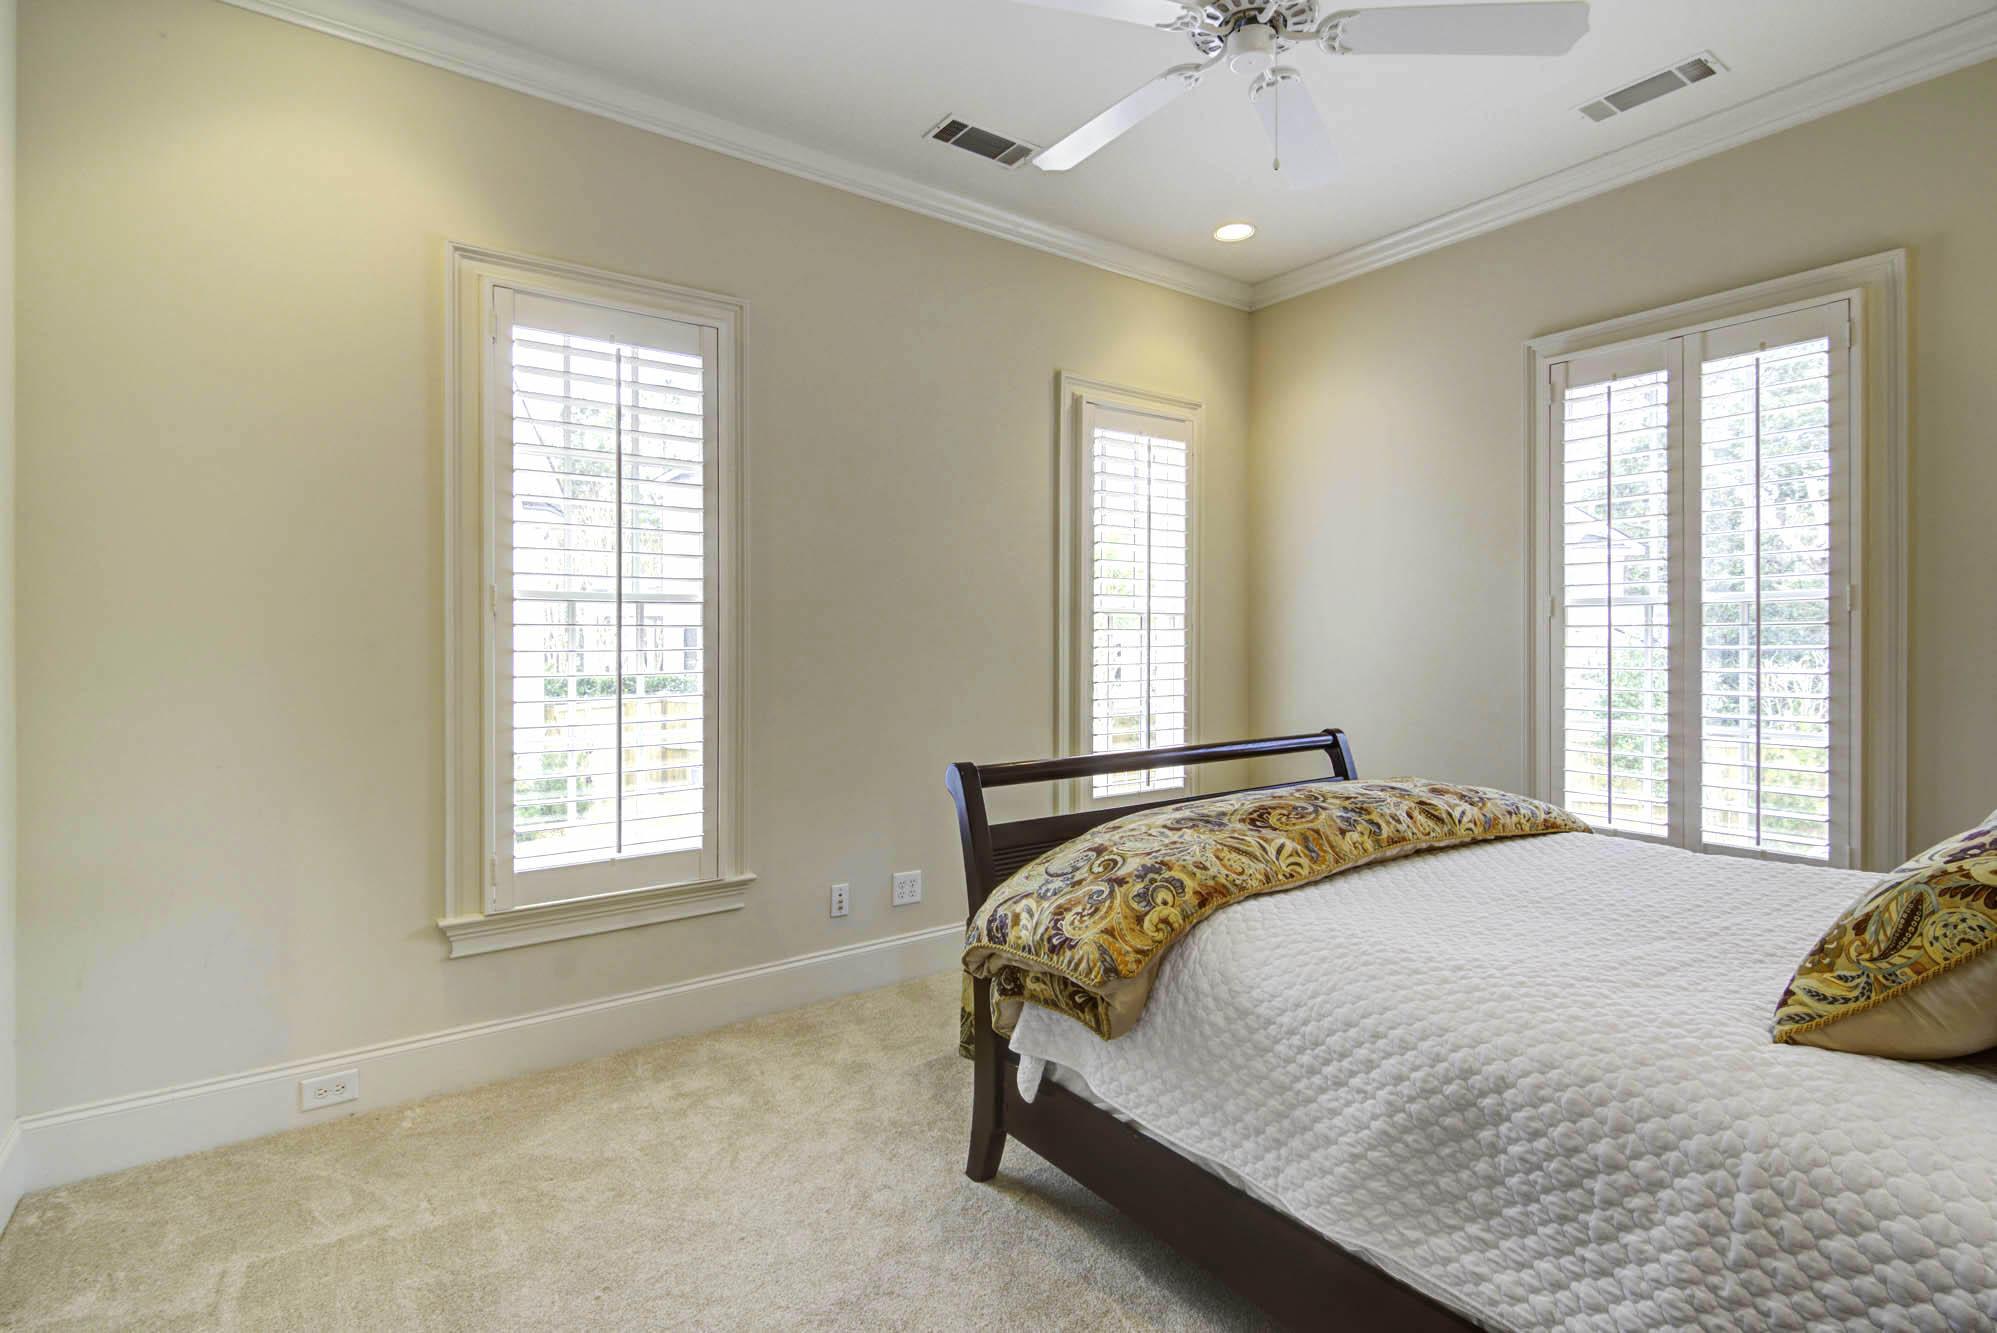 Olde Park Homes For Sale - 770 Olde Central, Mount Pleasant, SC - 10